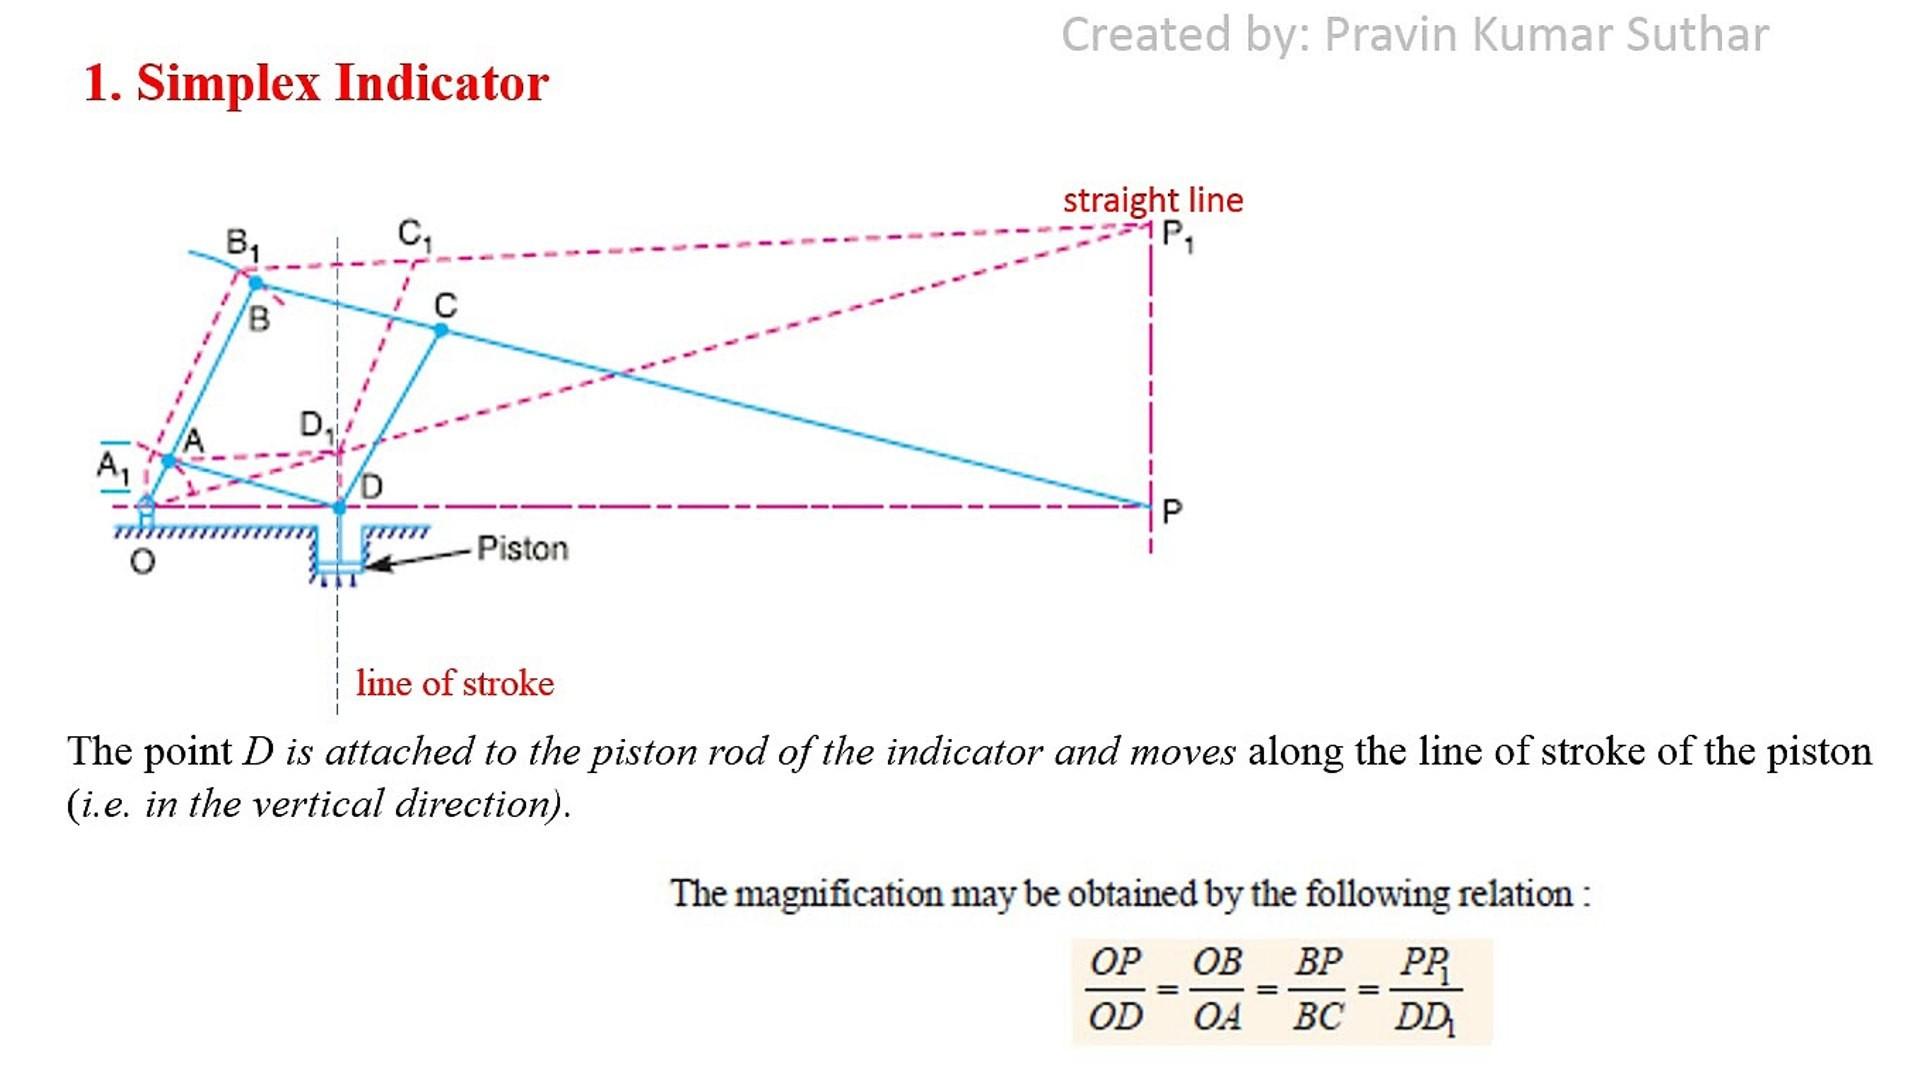 Car Engine Diagram Animation Engine Indicator Mechanism Mechanical Detailed Animation Video Of Car Engine Diagram Animation